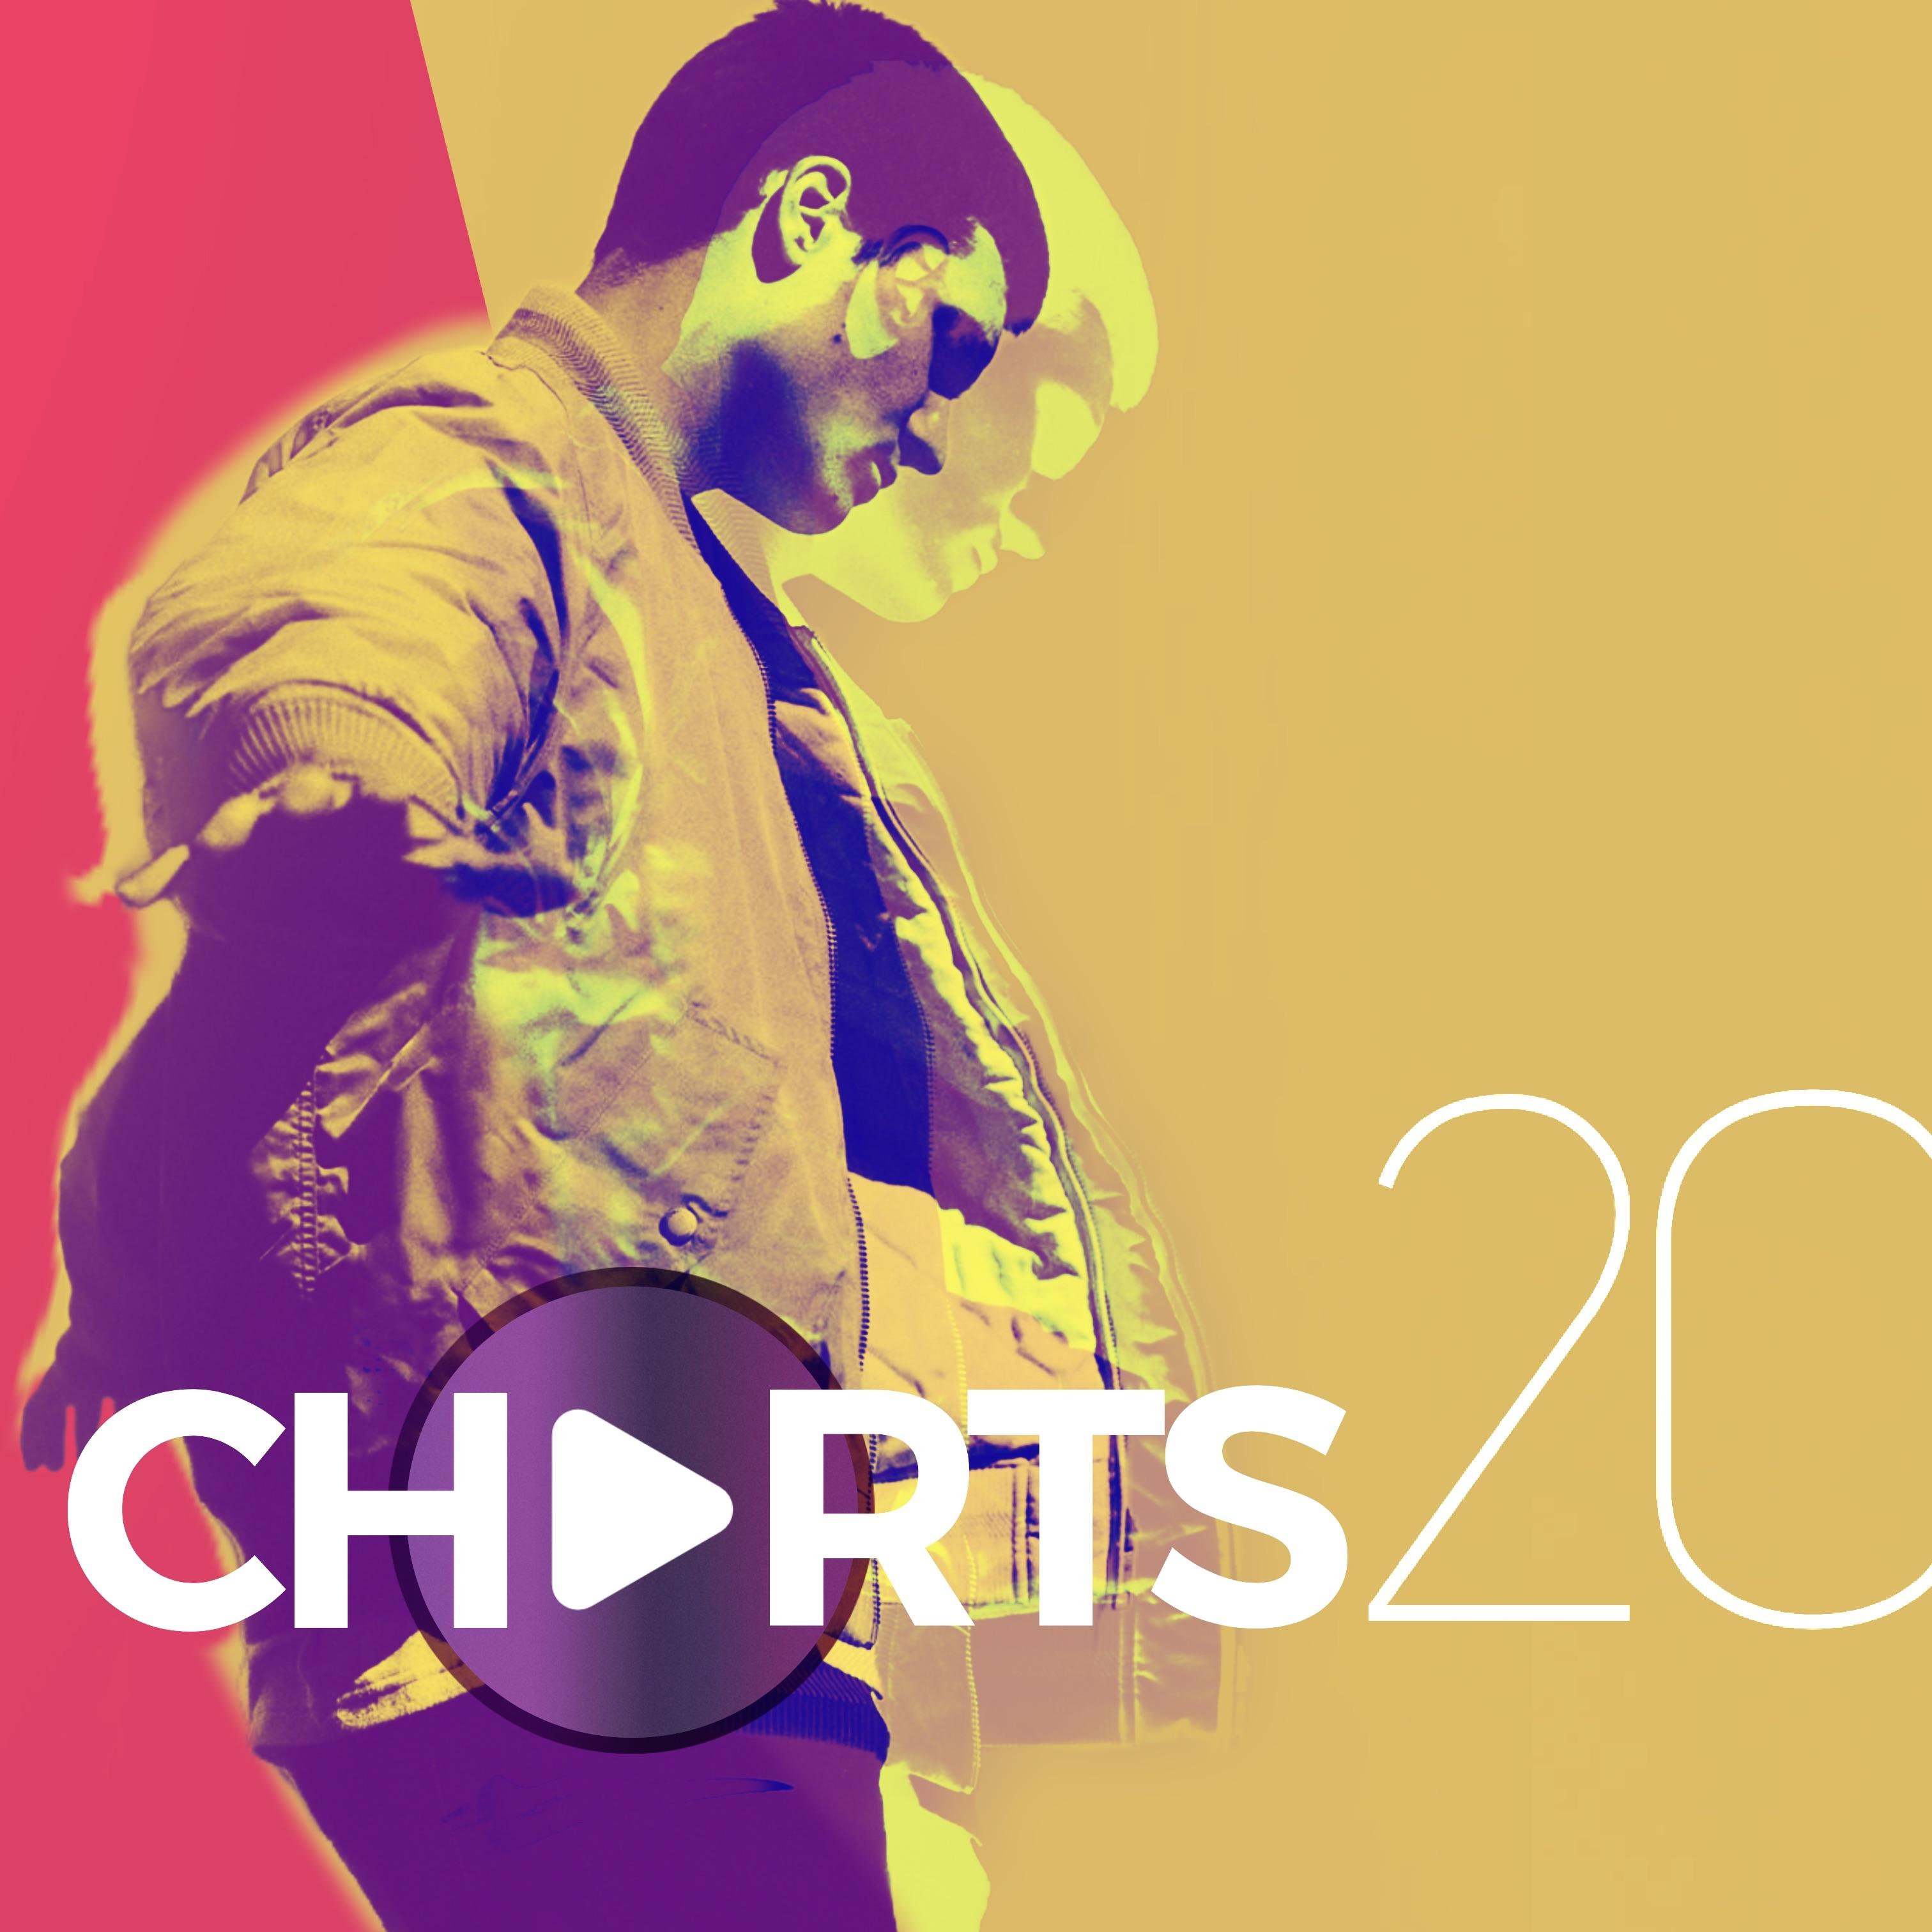 Charts 2020 Image